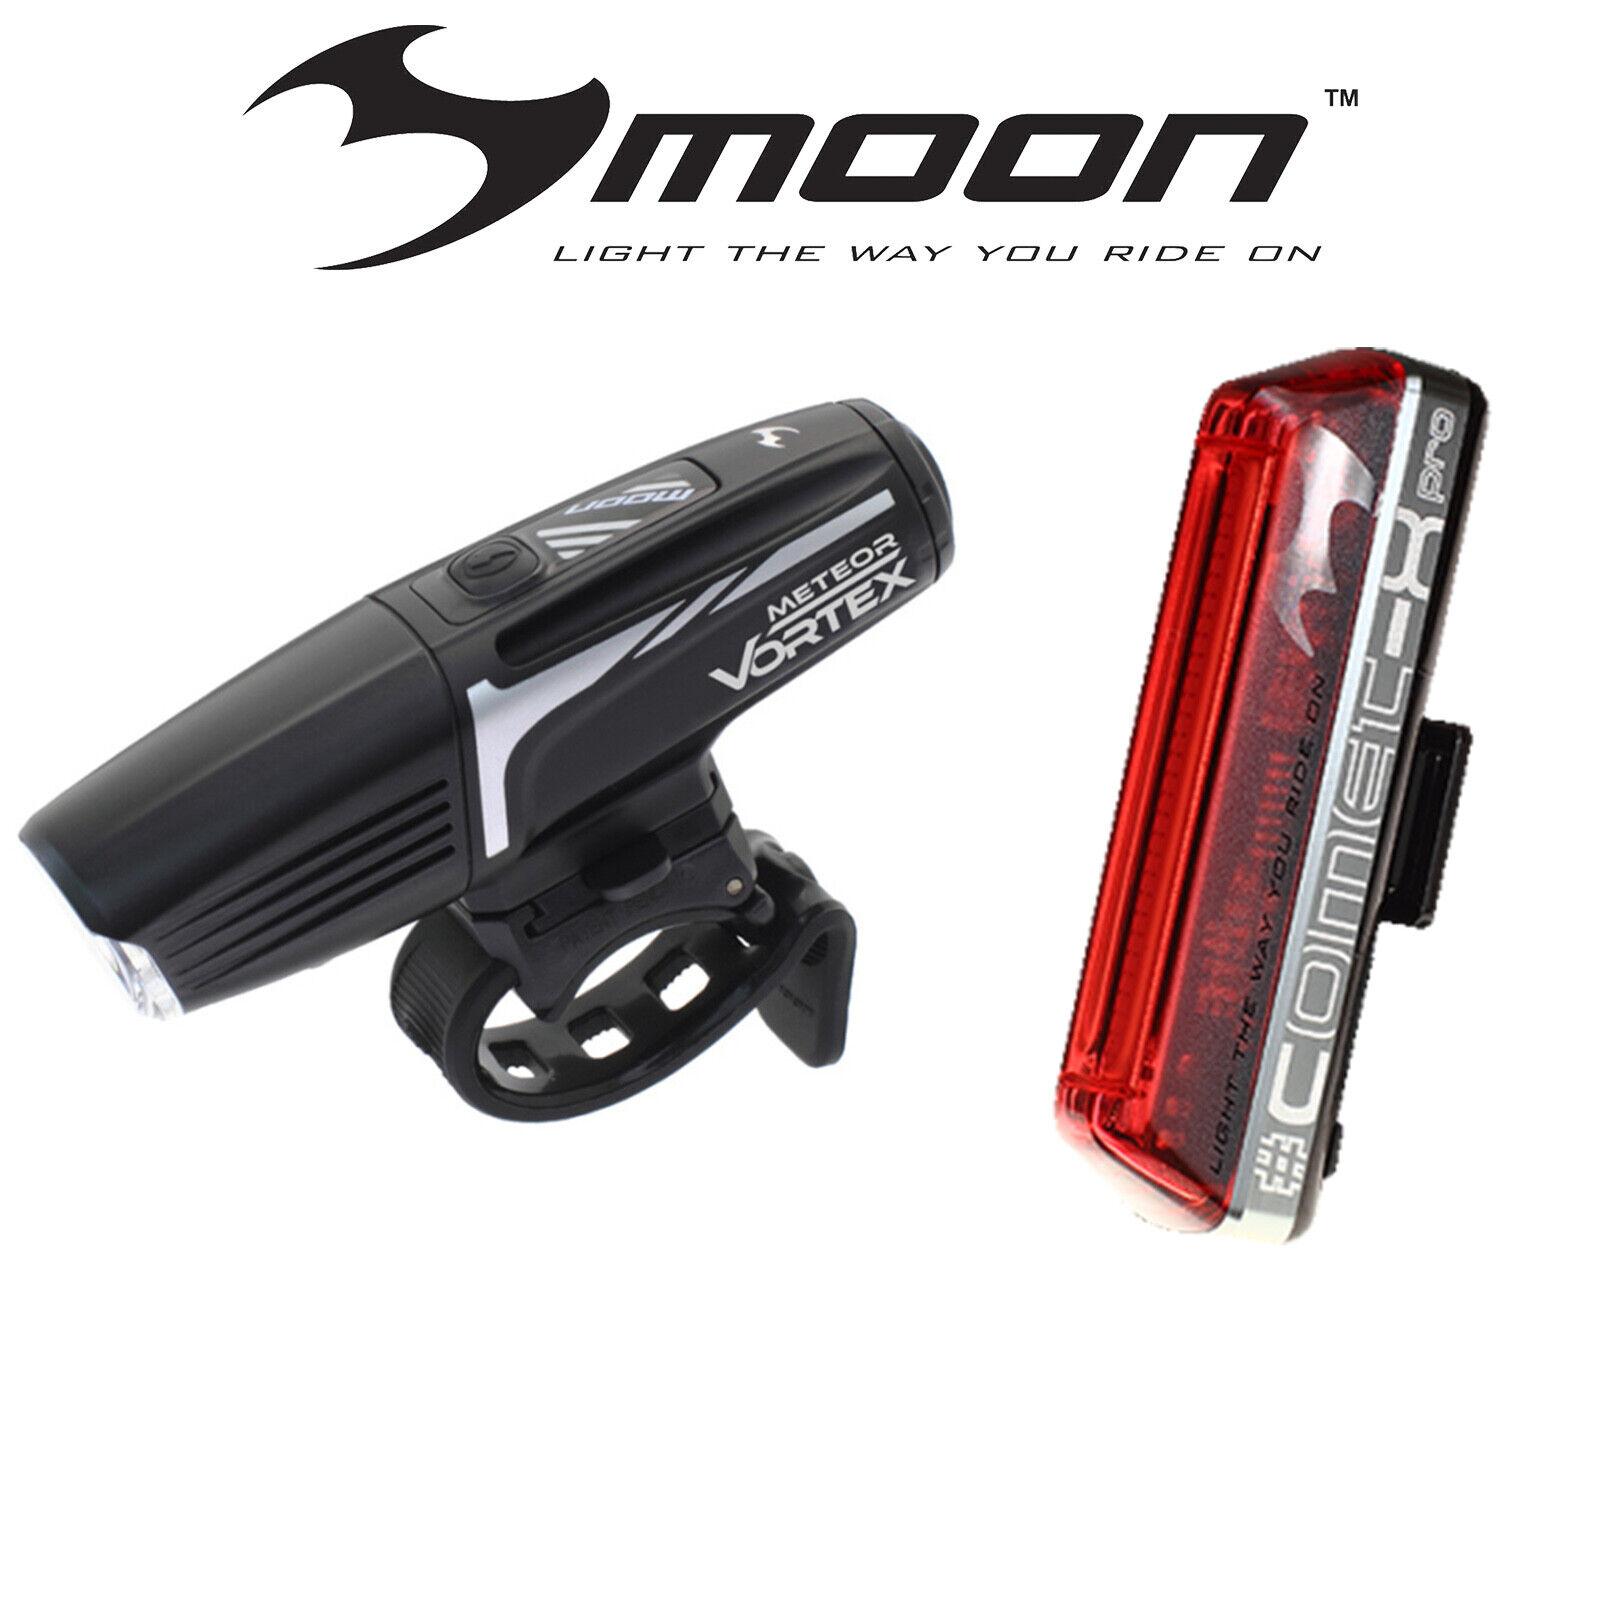 MOON VORTEX 600 davanti & COMET  X PRO REAR LIGHT SET gratuito EXPRESS POSTAGE